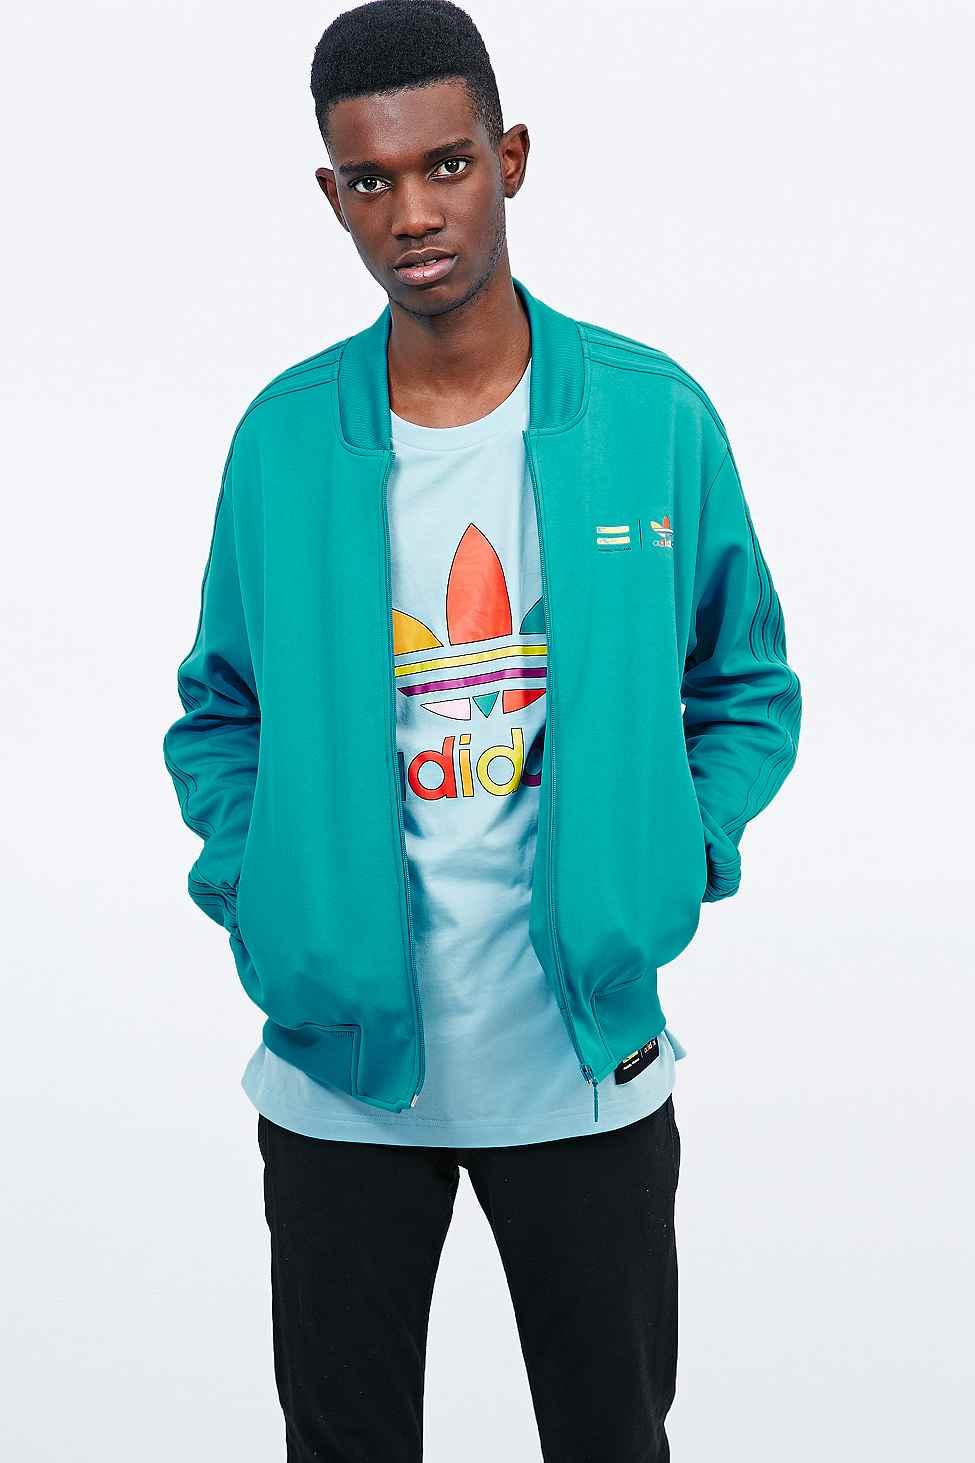 c2d3f06c7 adidas Originals X Pharrell Supercolor Track Jacket In Turquoise in ...